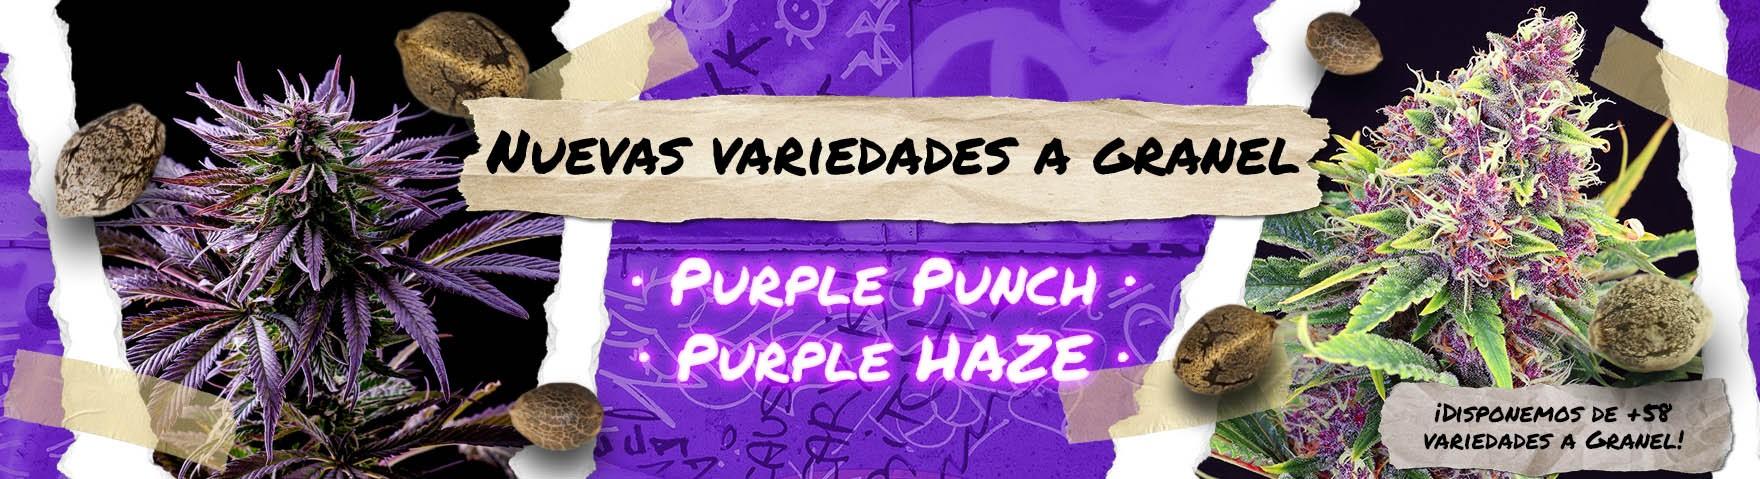 Nuevas Granel Purple